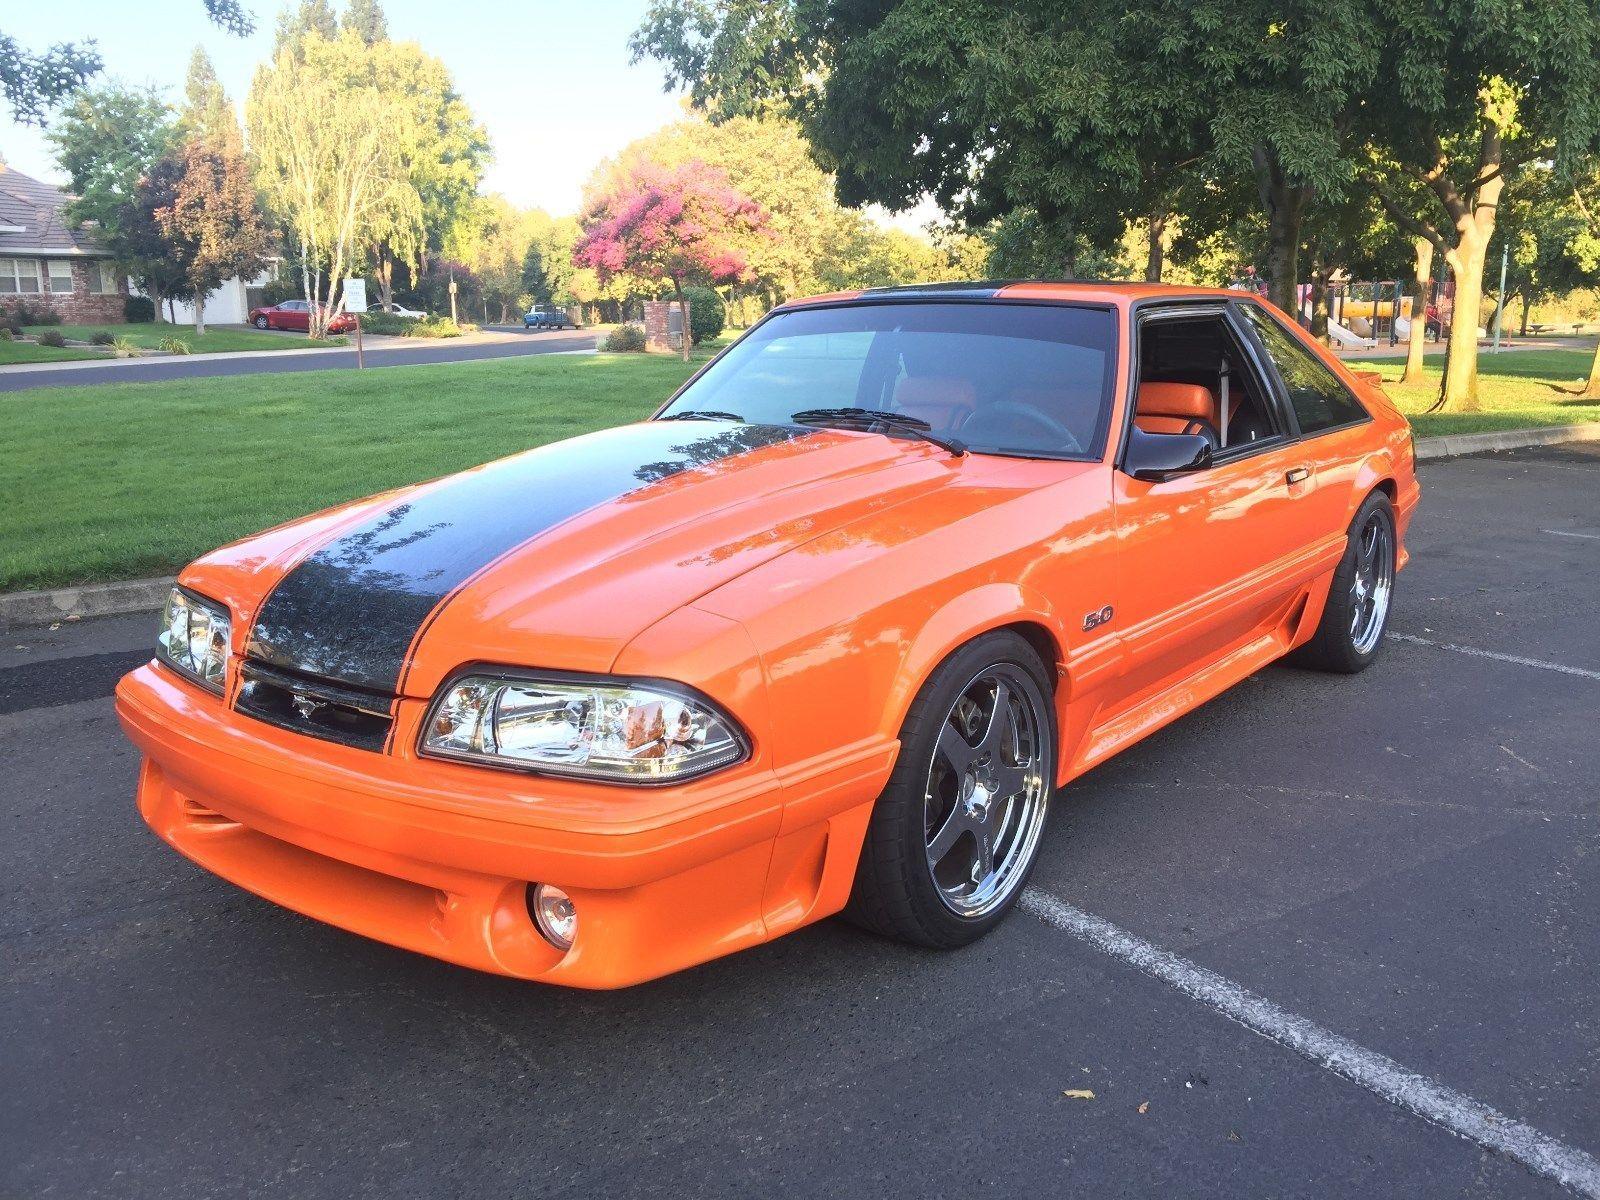 Ebay 1992 Ford Mustang Gt Keith Craft 550hp Tremec Tko600 5 Speed